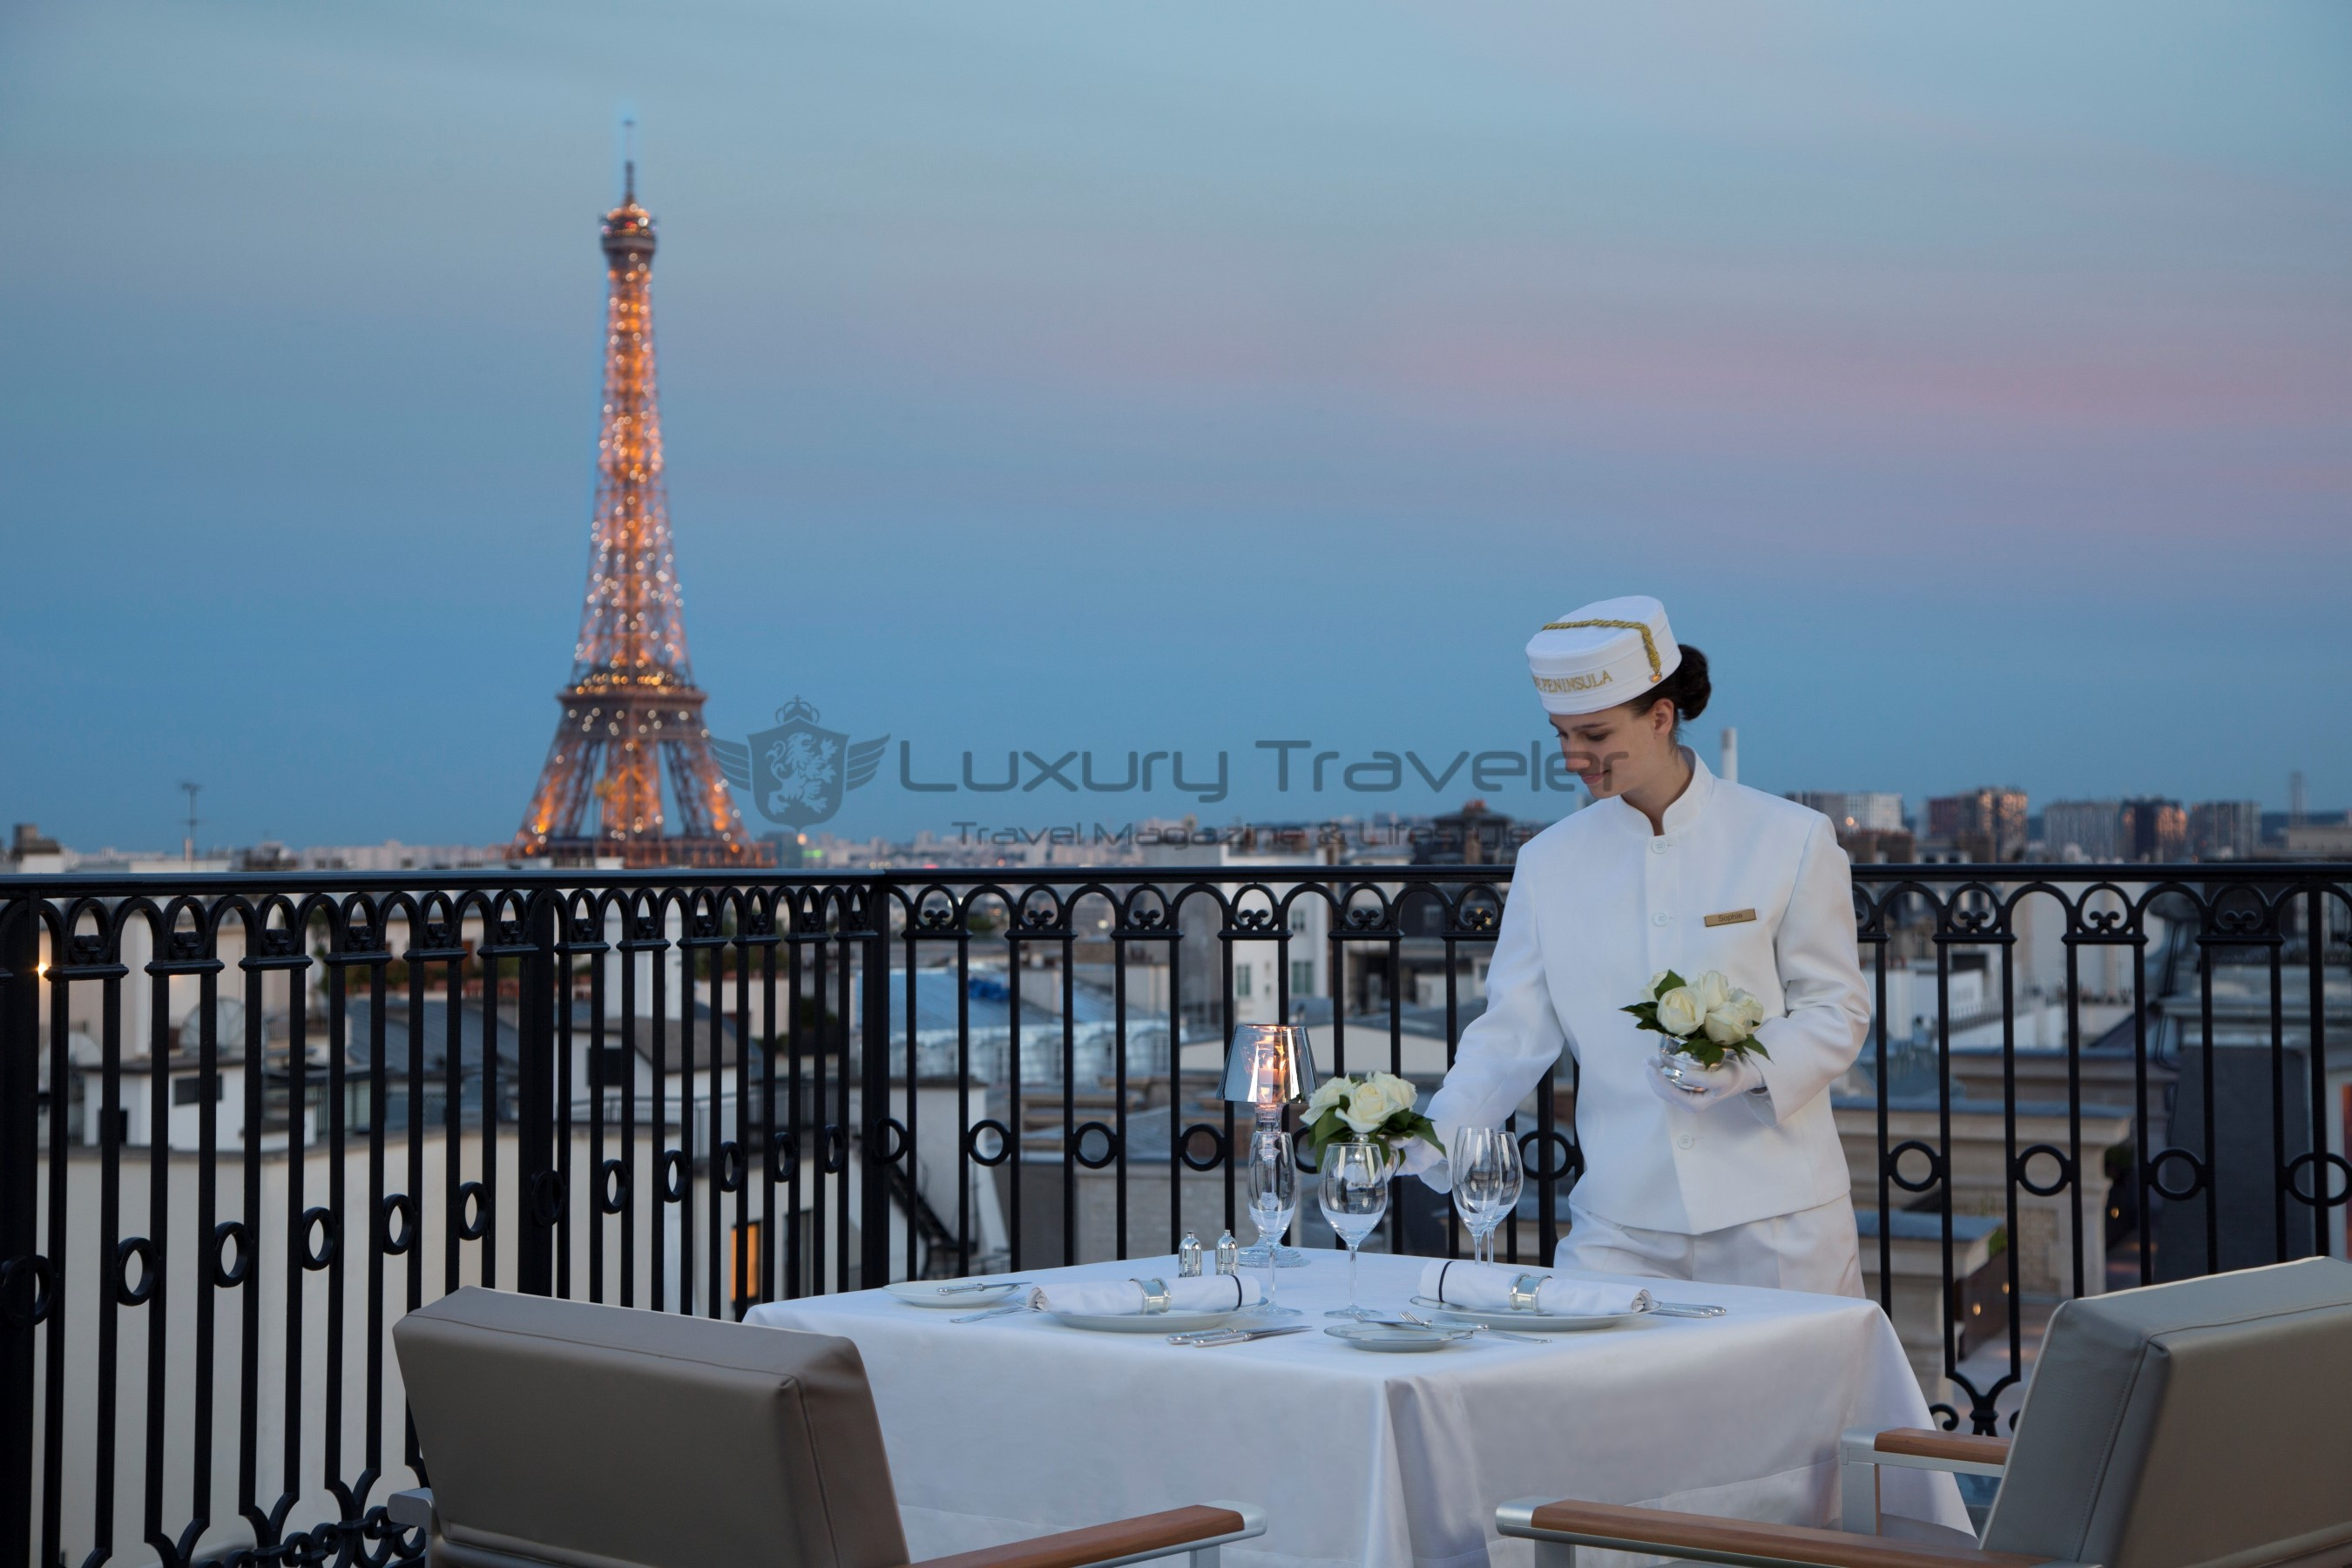 The Peninsula Luxury 5 Star Hotel Paris Luxury Traveler